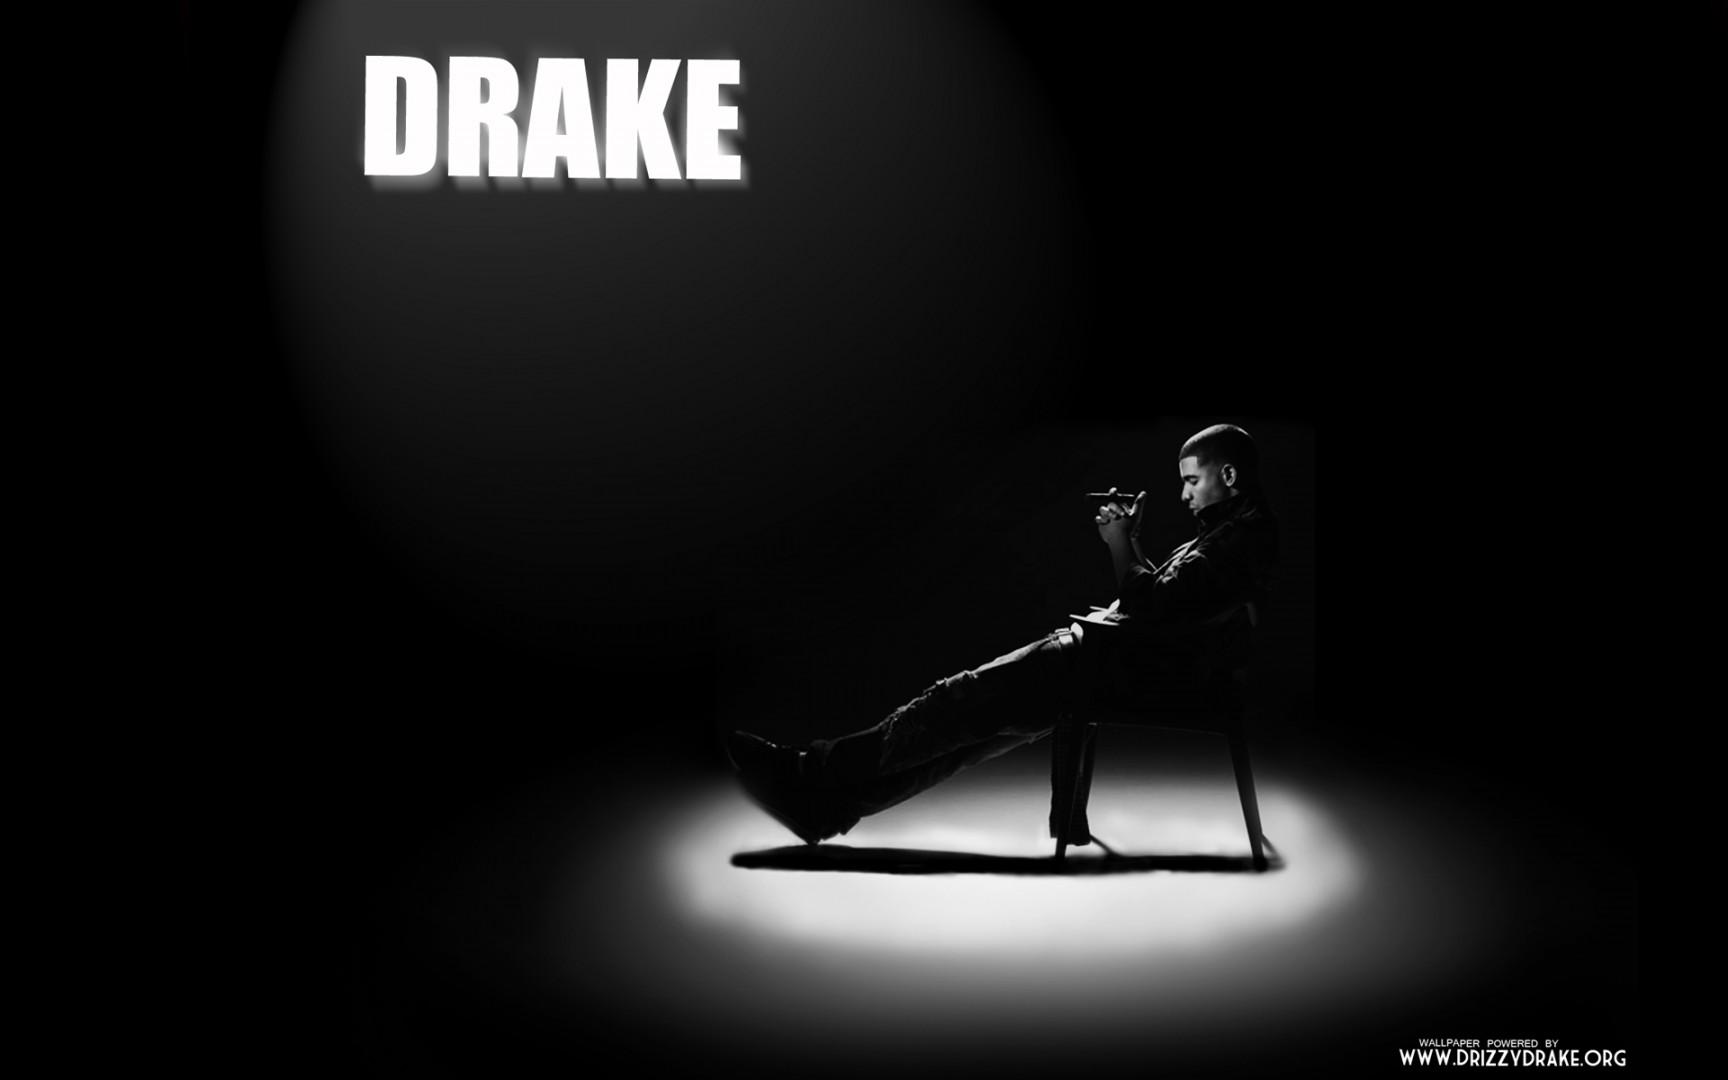 Drake Wallpaper 5jpg 1728x1080